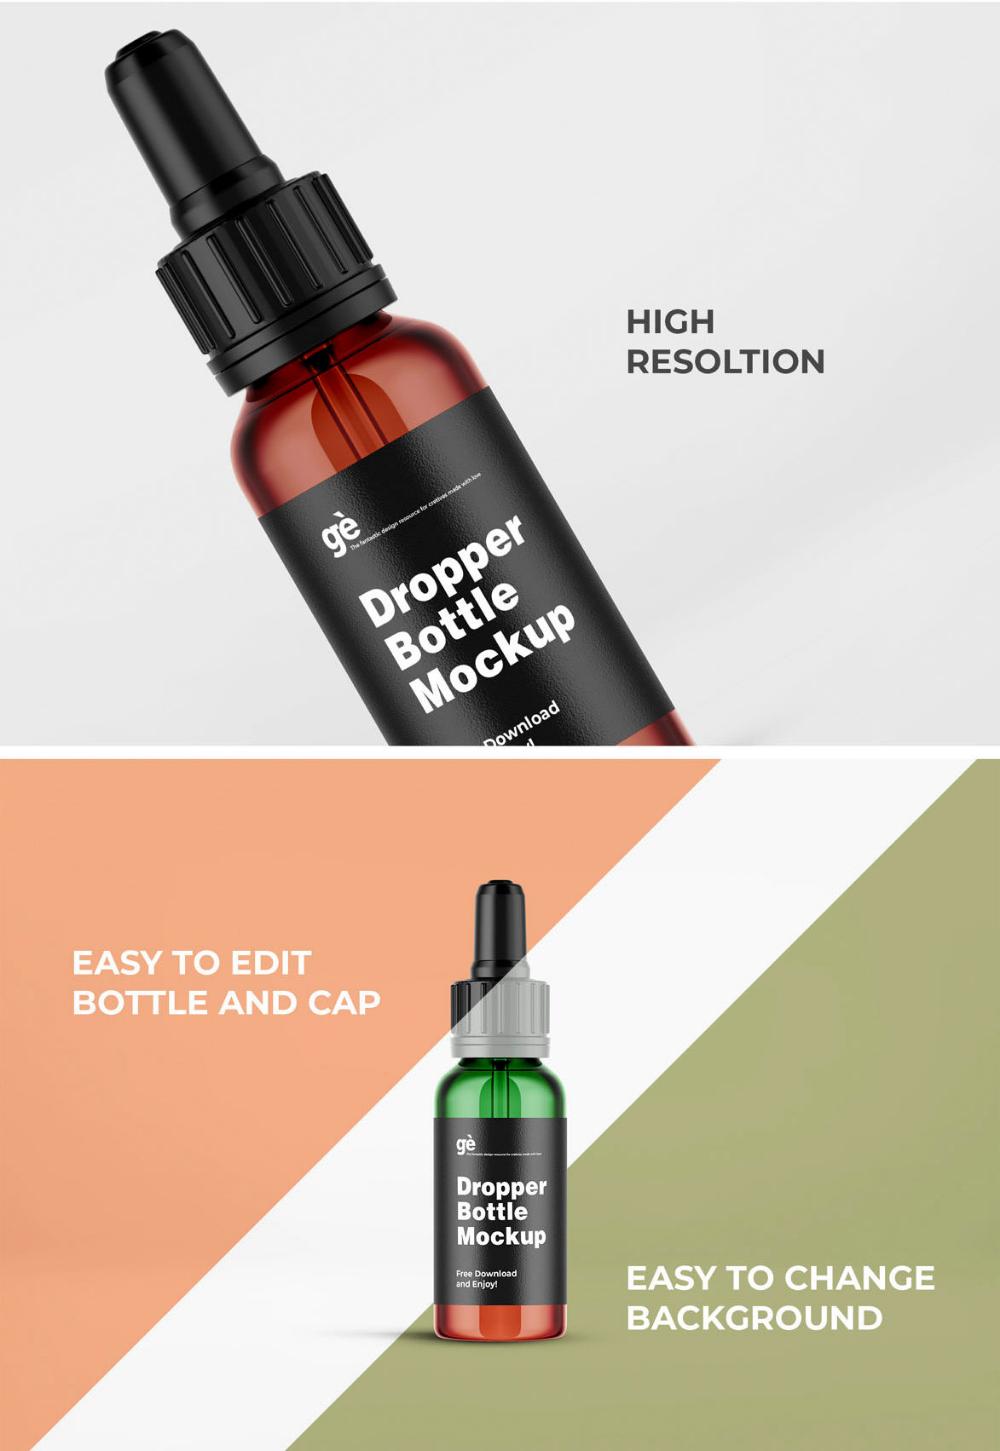 Free Amber Glass Small Dropper Bottle Mockup Free Package Mockups In 2021 Dropper Bottles Bottle Mockup Bottle